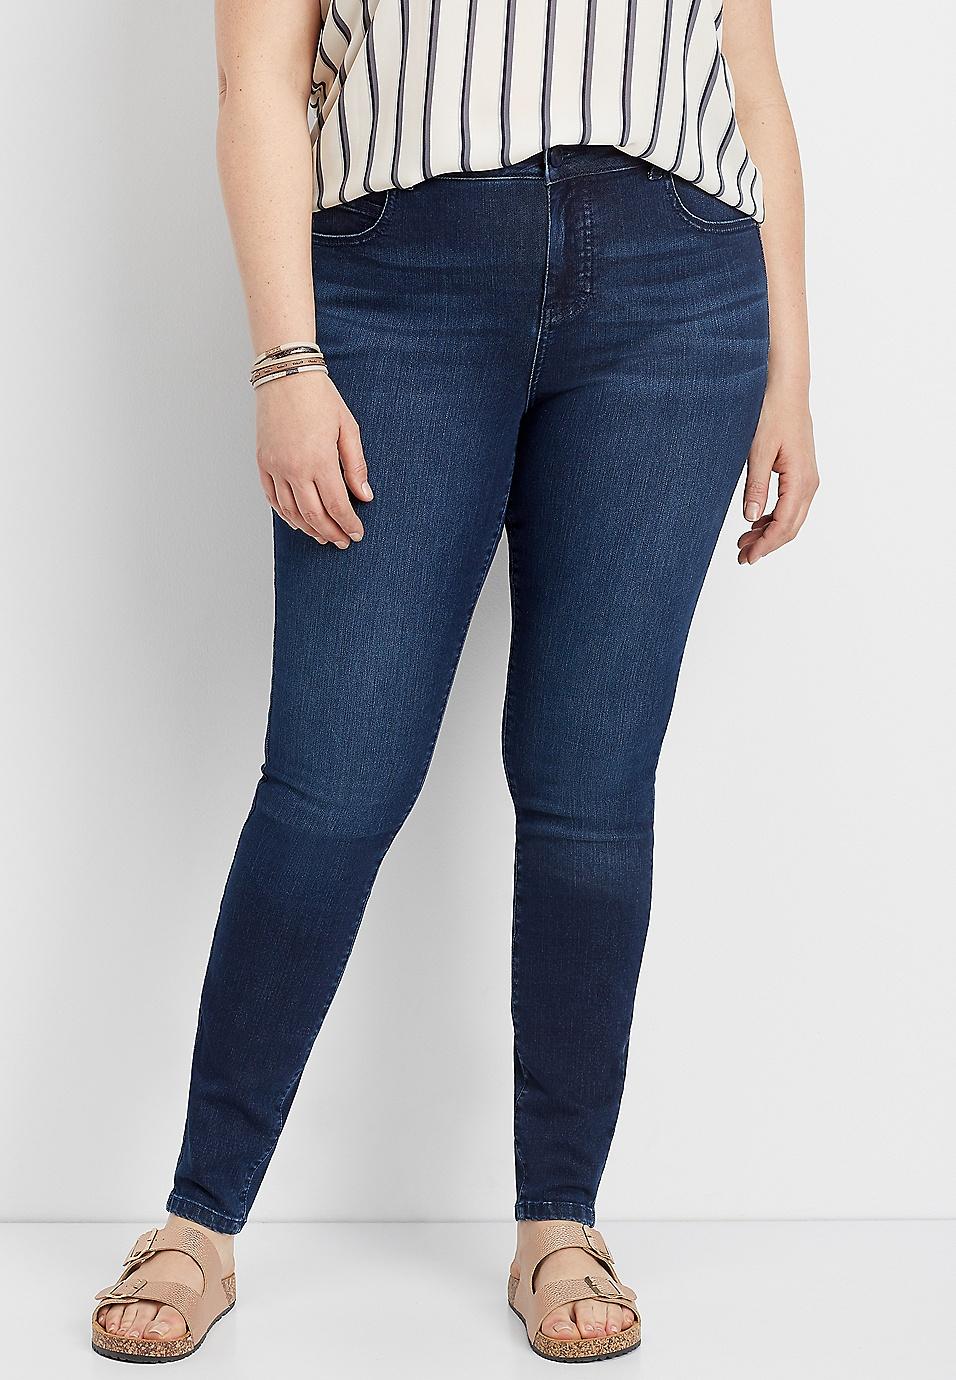 2eb5a097a29 plus size Everflex™ dark rinse high rise skinny jean